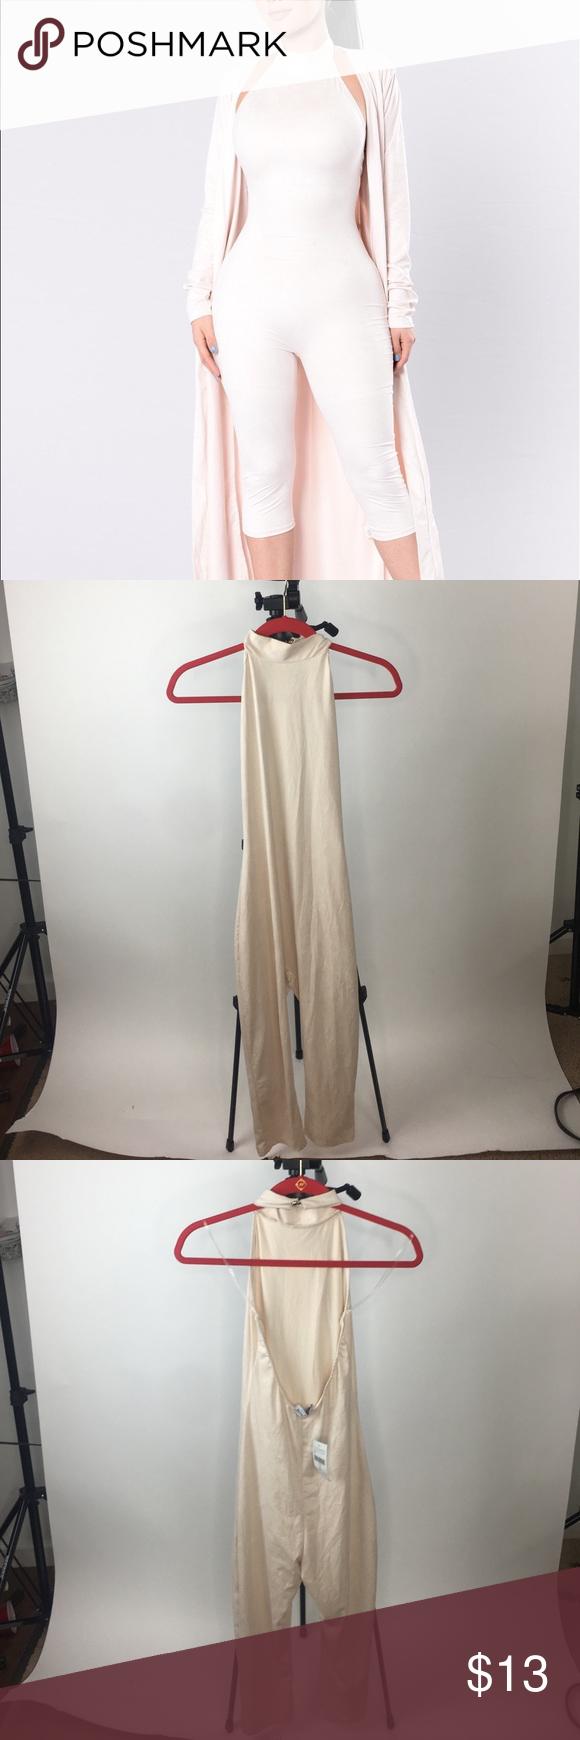 04f1c34aba20 Fashion Nova Shattered Glass Jumpsuit Nude